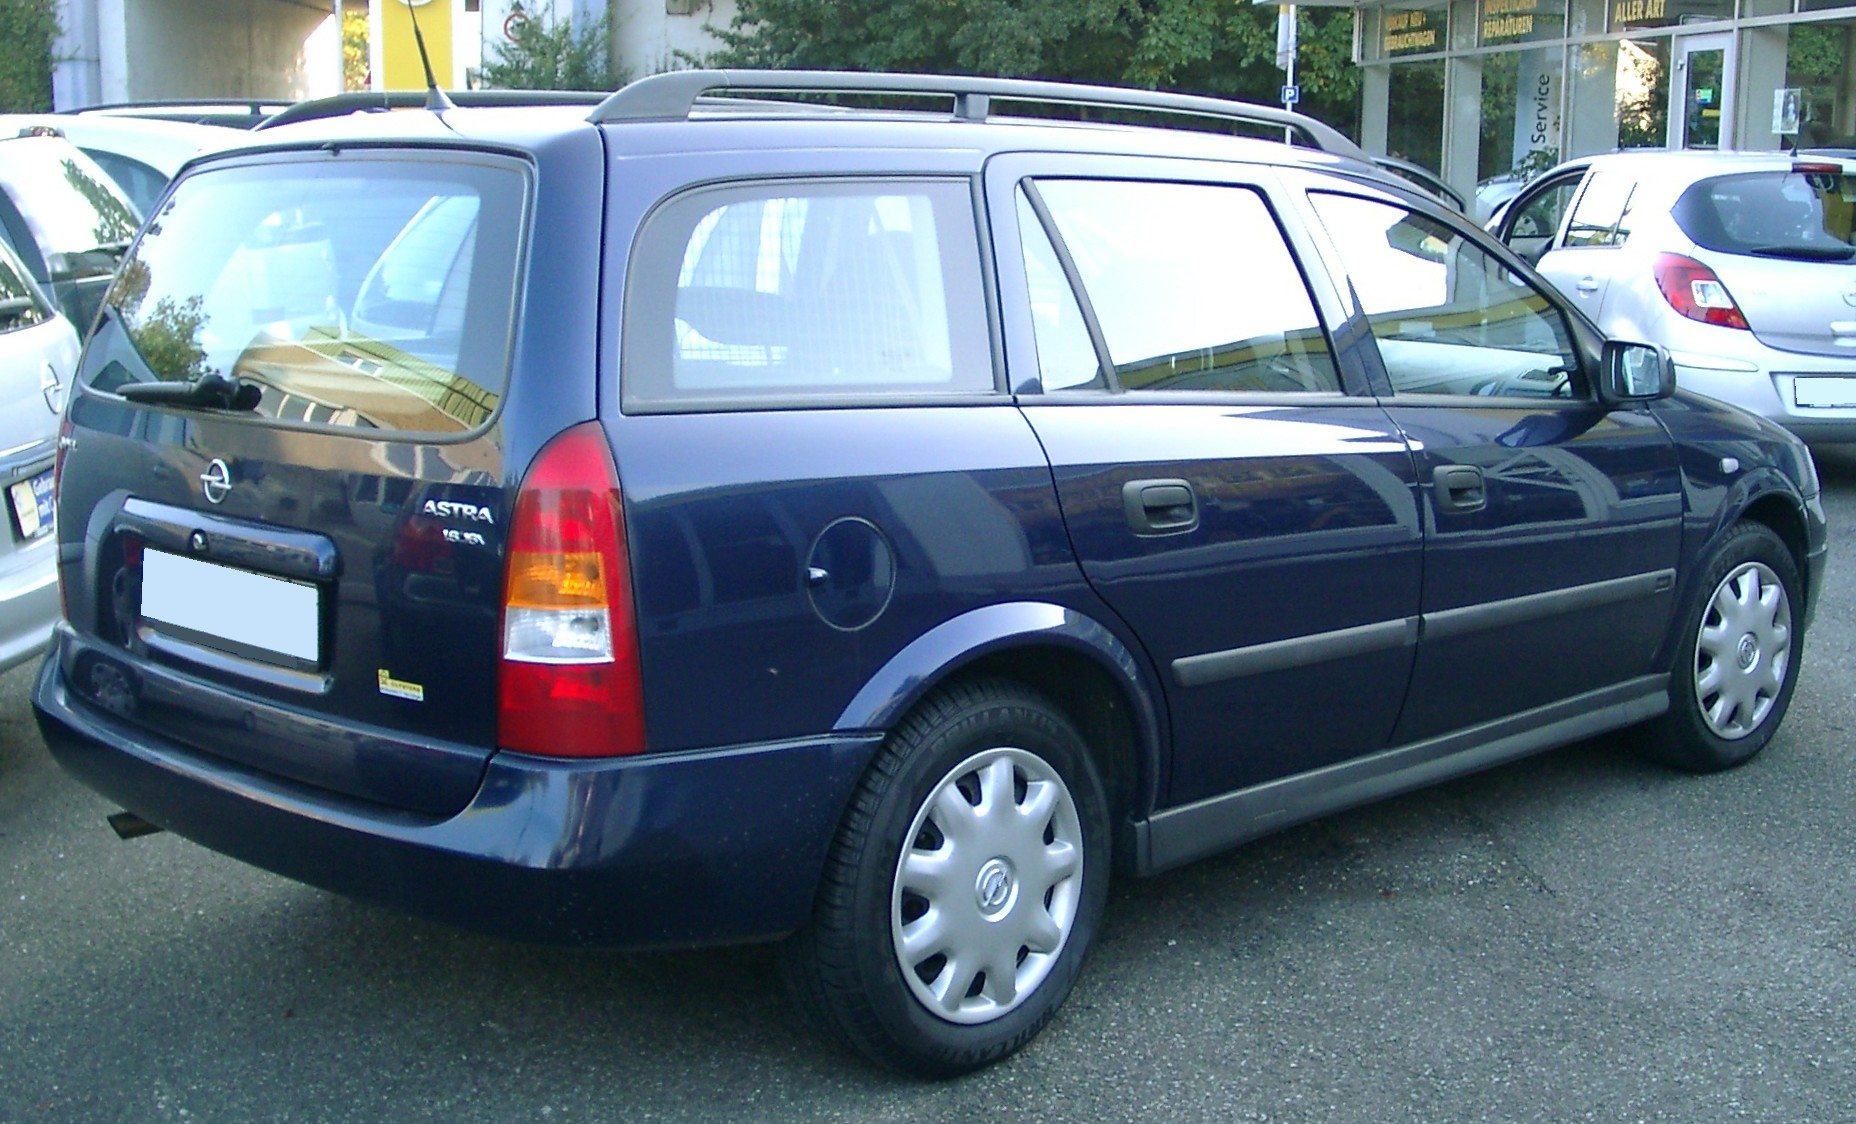 Opel_Astra_Caravan_rear_20071007